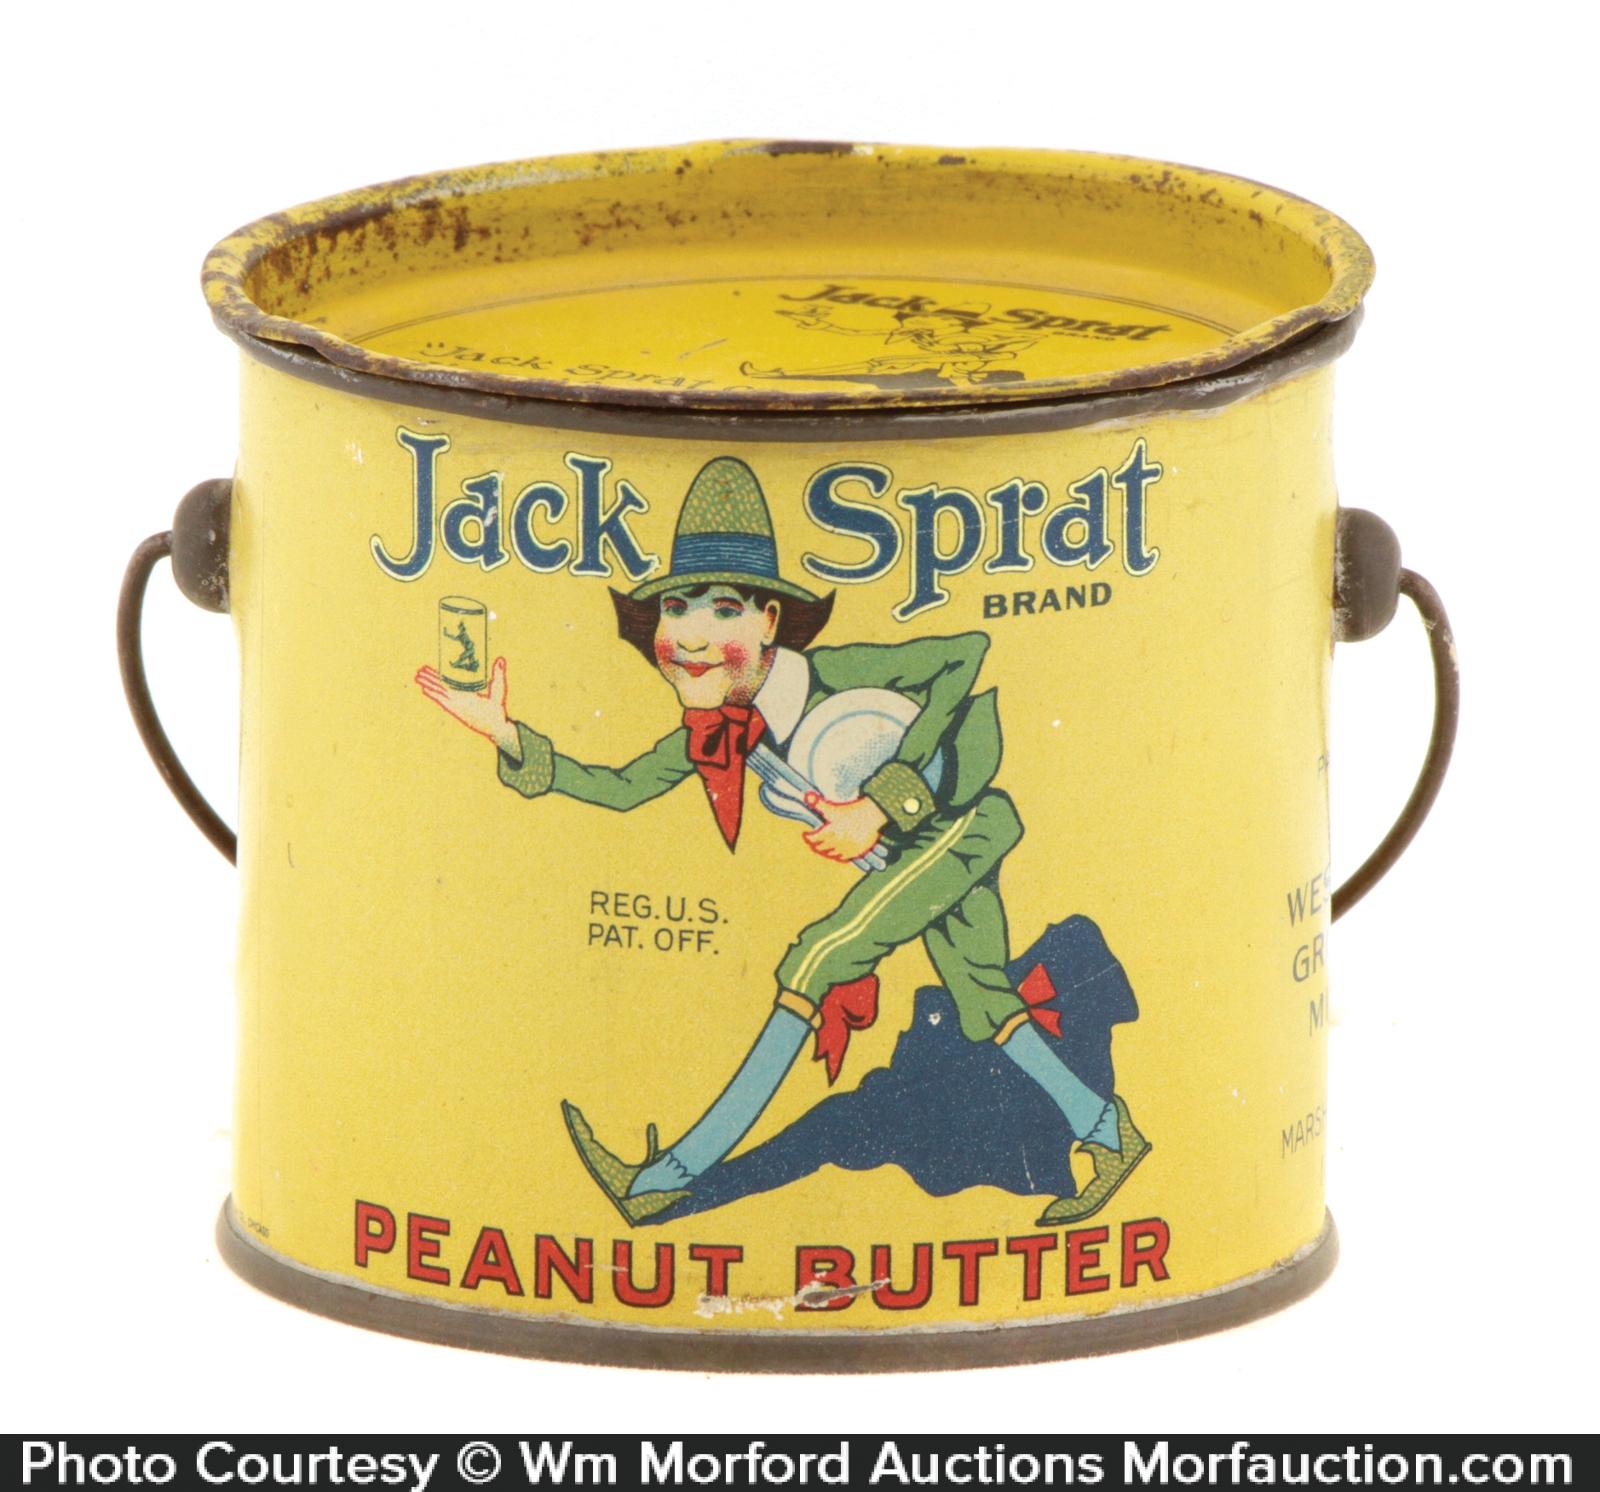 Jack Sprat Peanut Butter Tin